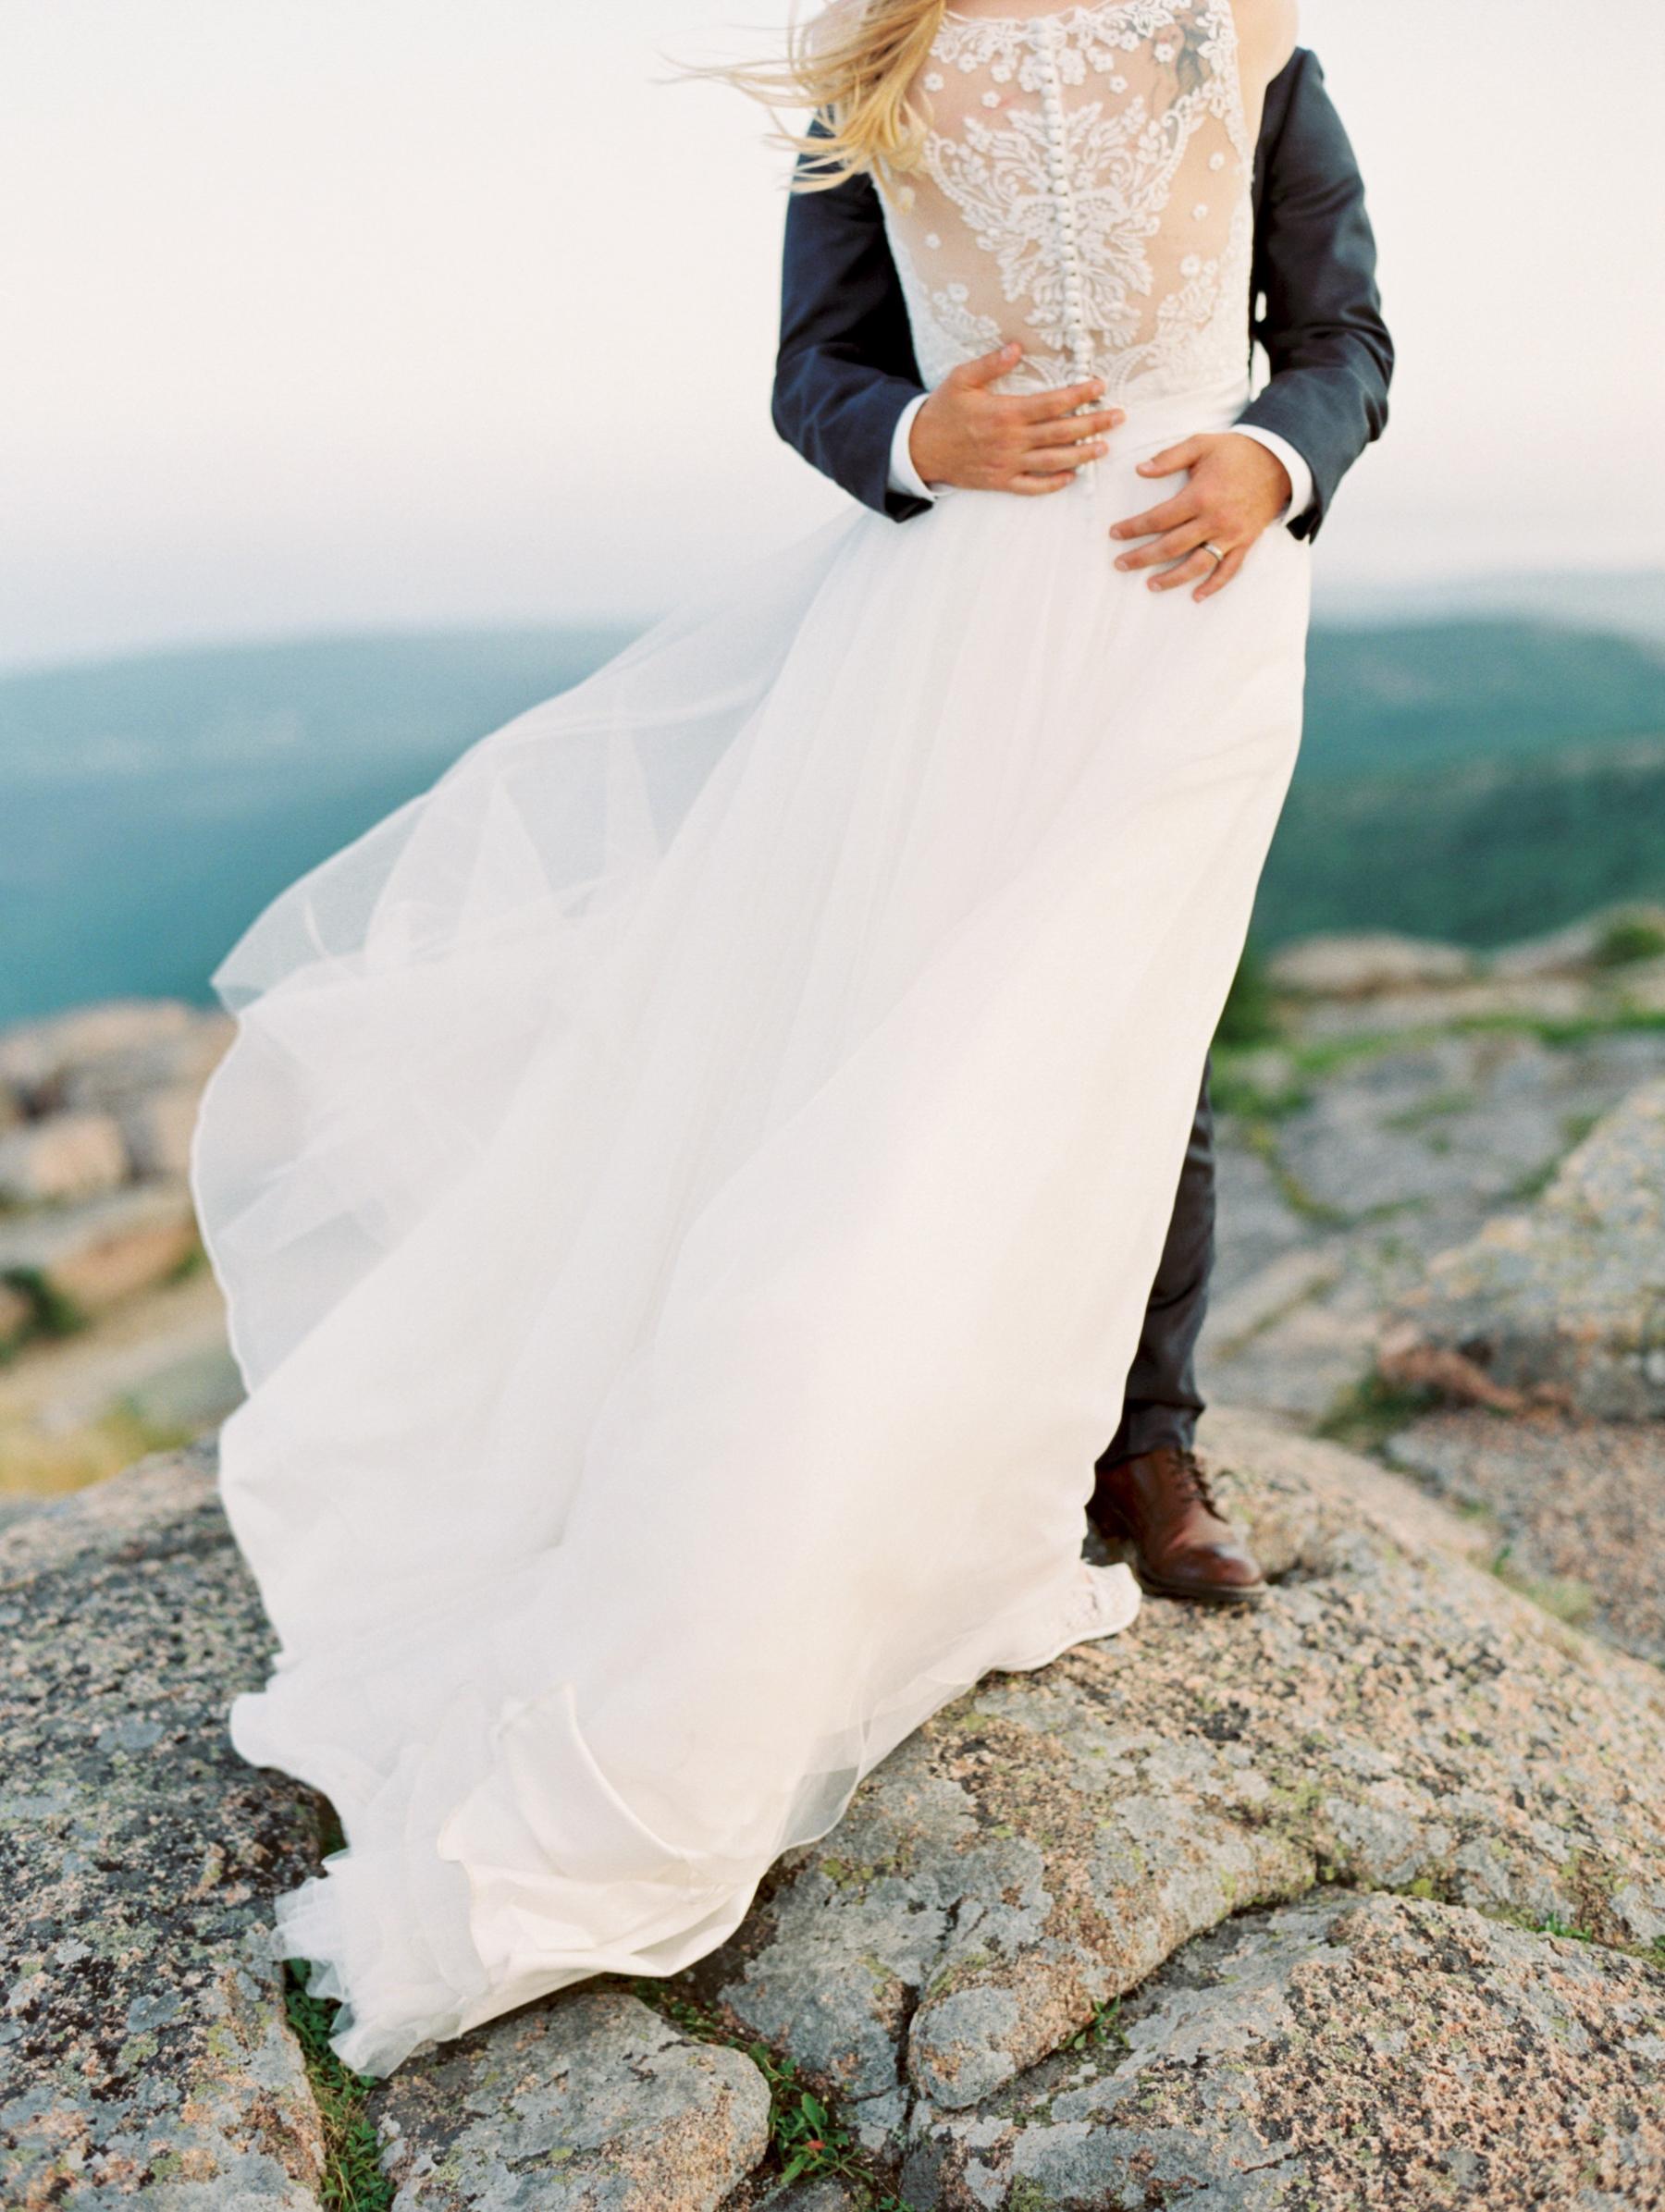 Fine_Art_Film_Wedding_Photographer_Bar_Harbor_Maine_Cadillac_Mountain_Jordan_Pond_Kati_Rosado_Photography-44.jpg